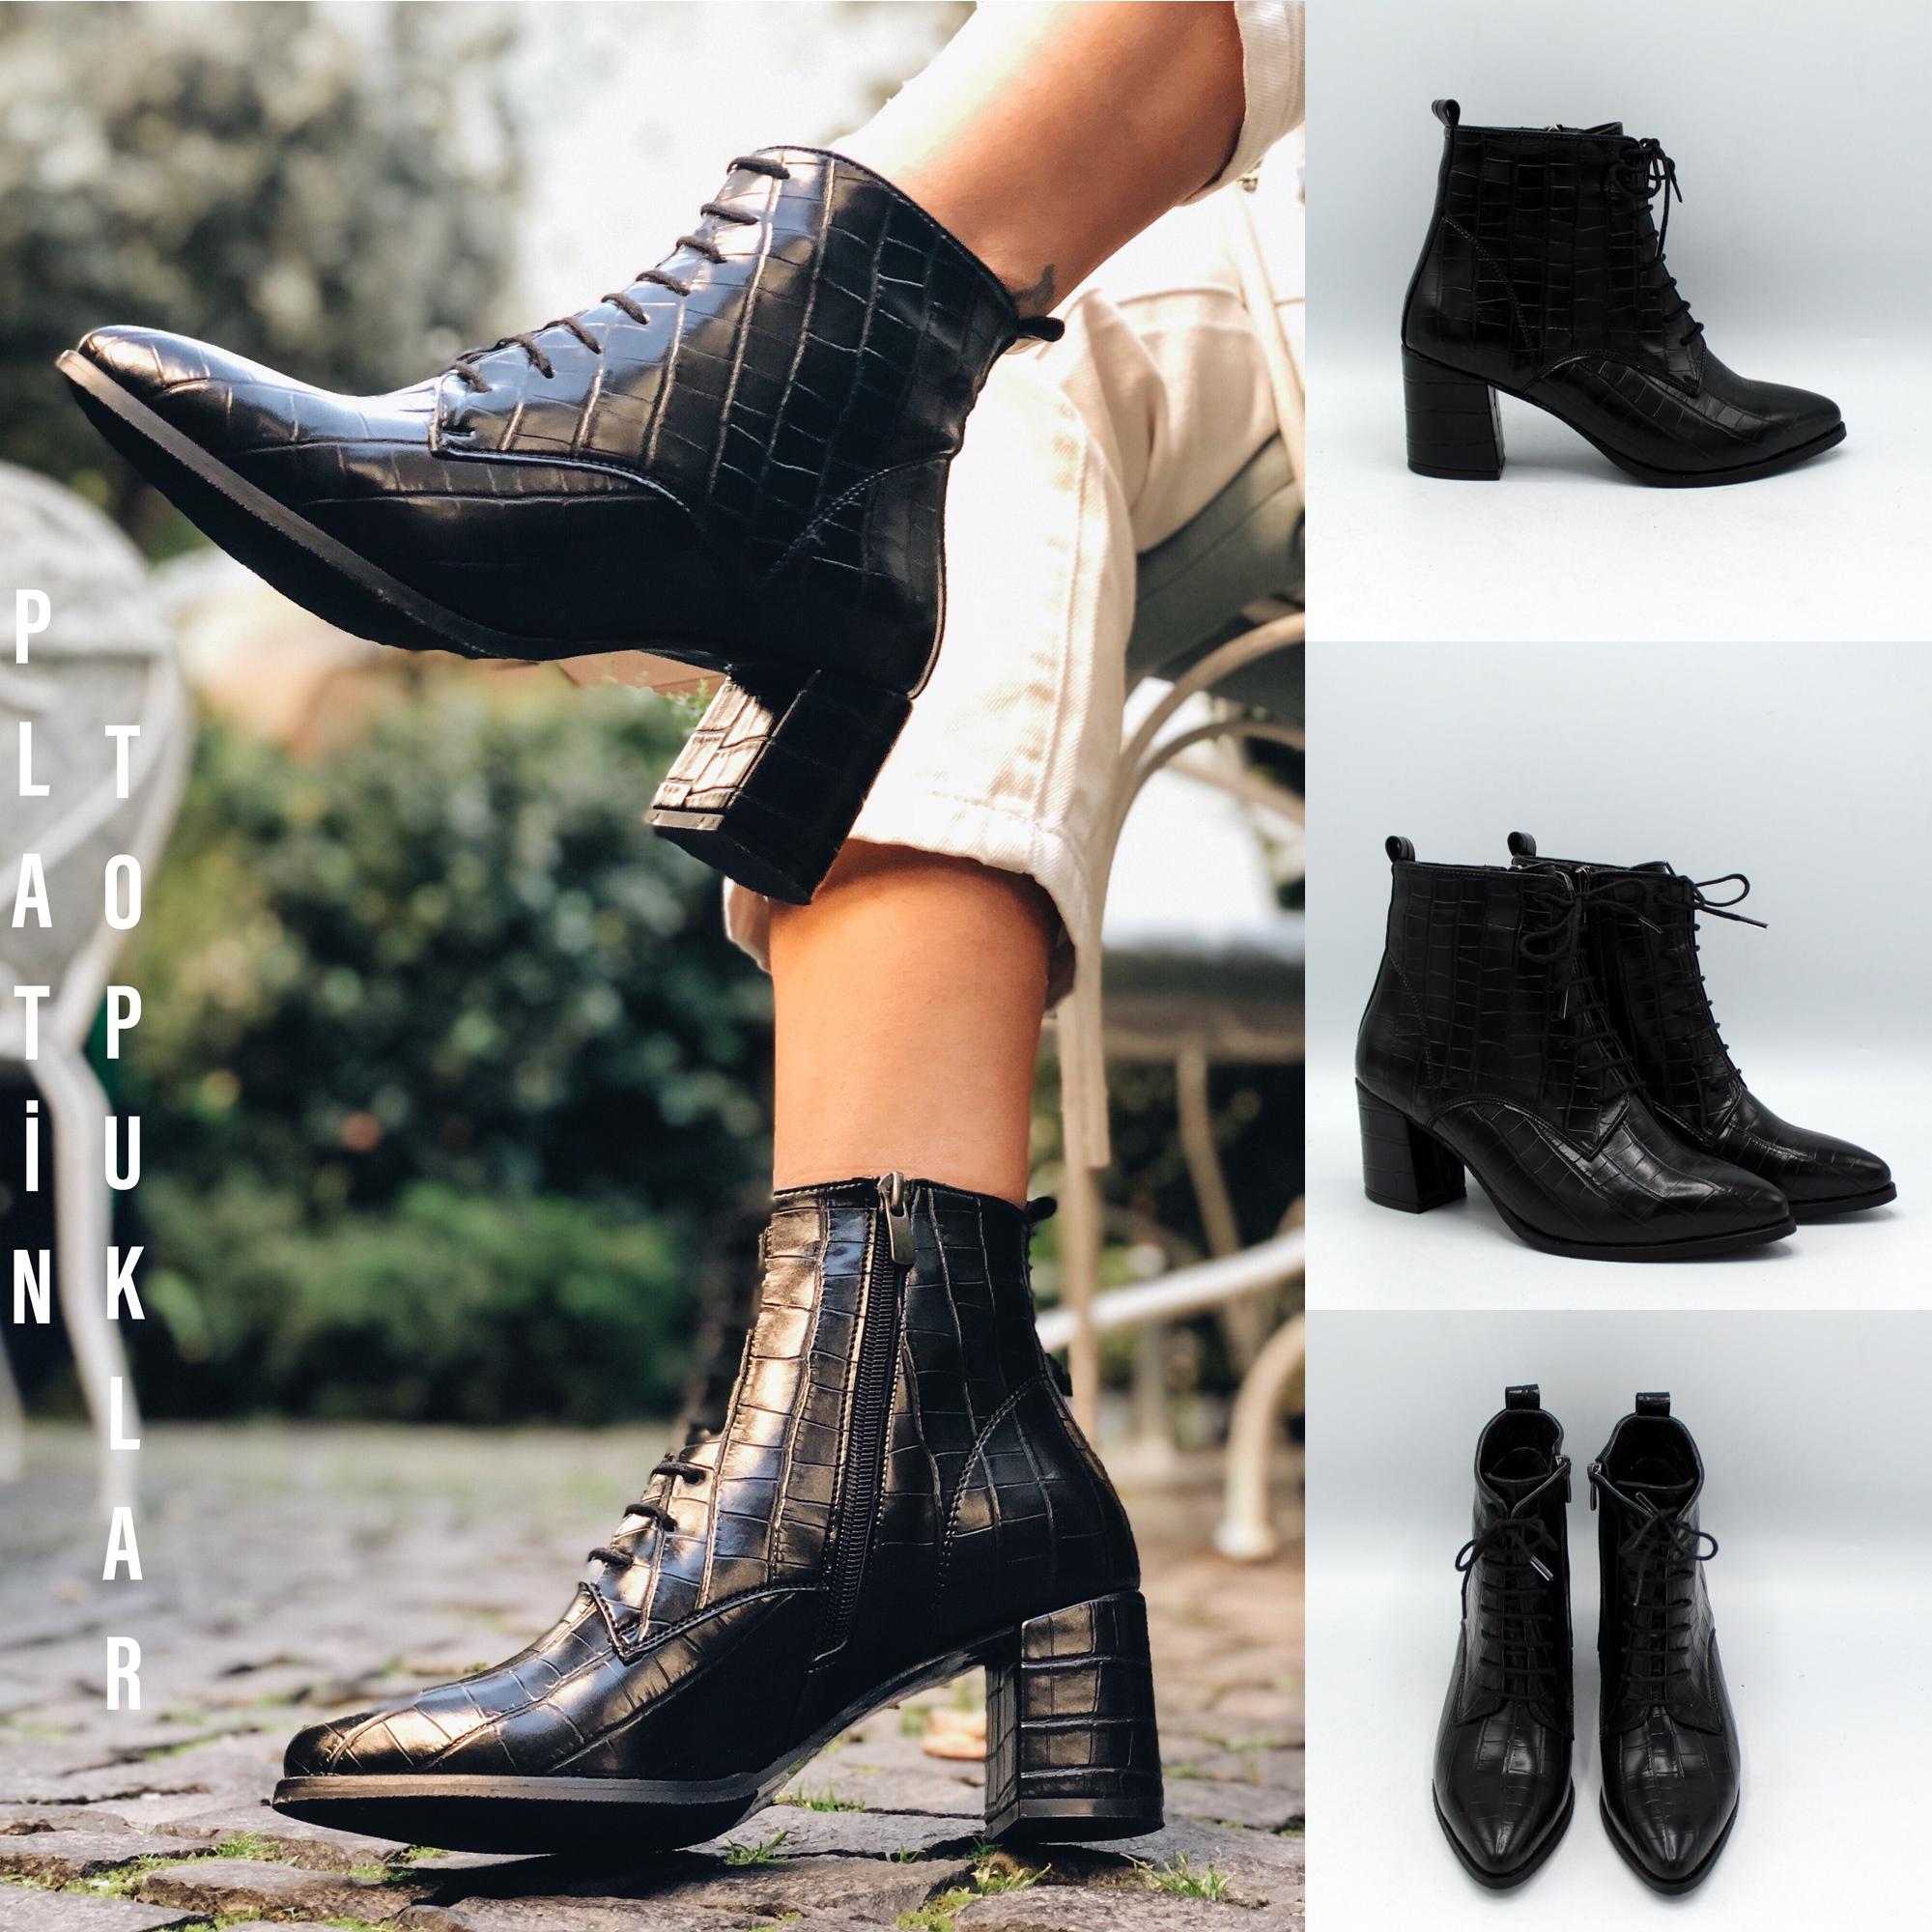 High Heel Women Stylish Crocodile Boots Trend Footwear